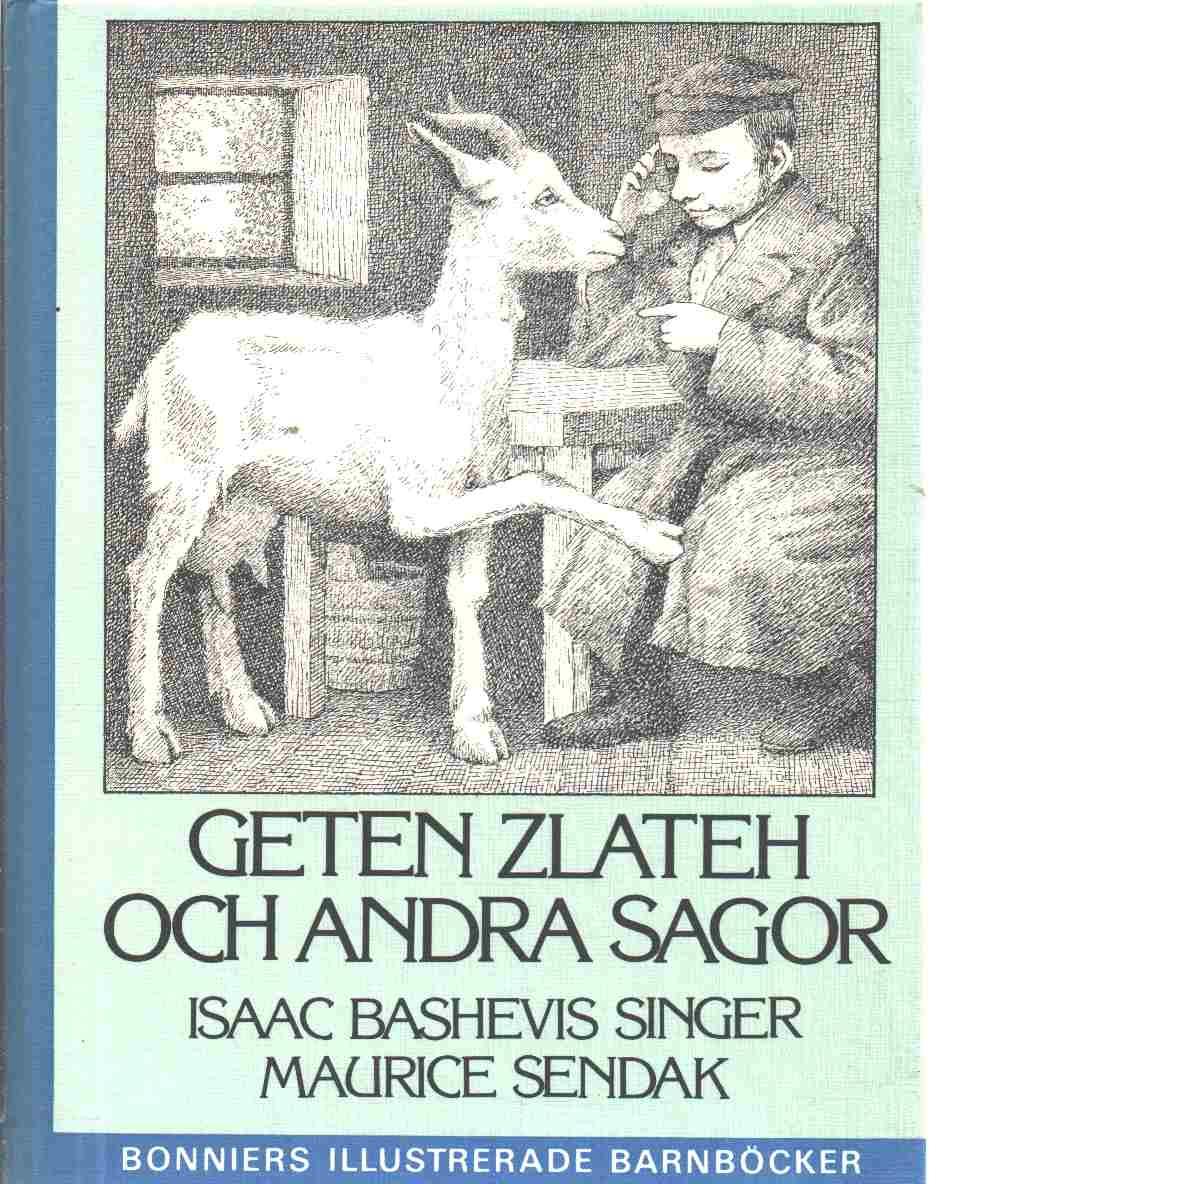 Geten Zlateh och andra sagor - Singer, Isaac Bashevis och Sendak, Maurice